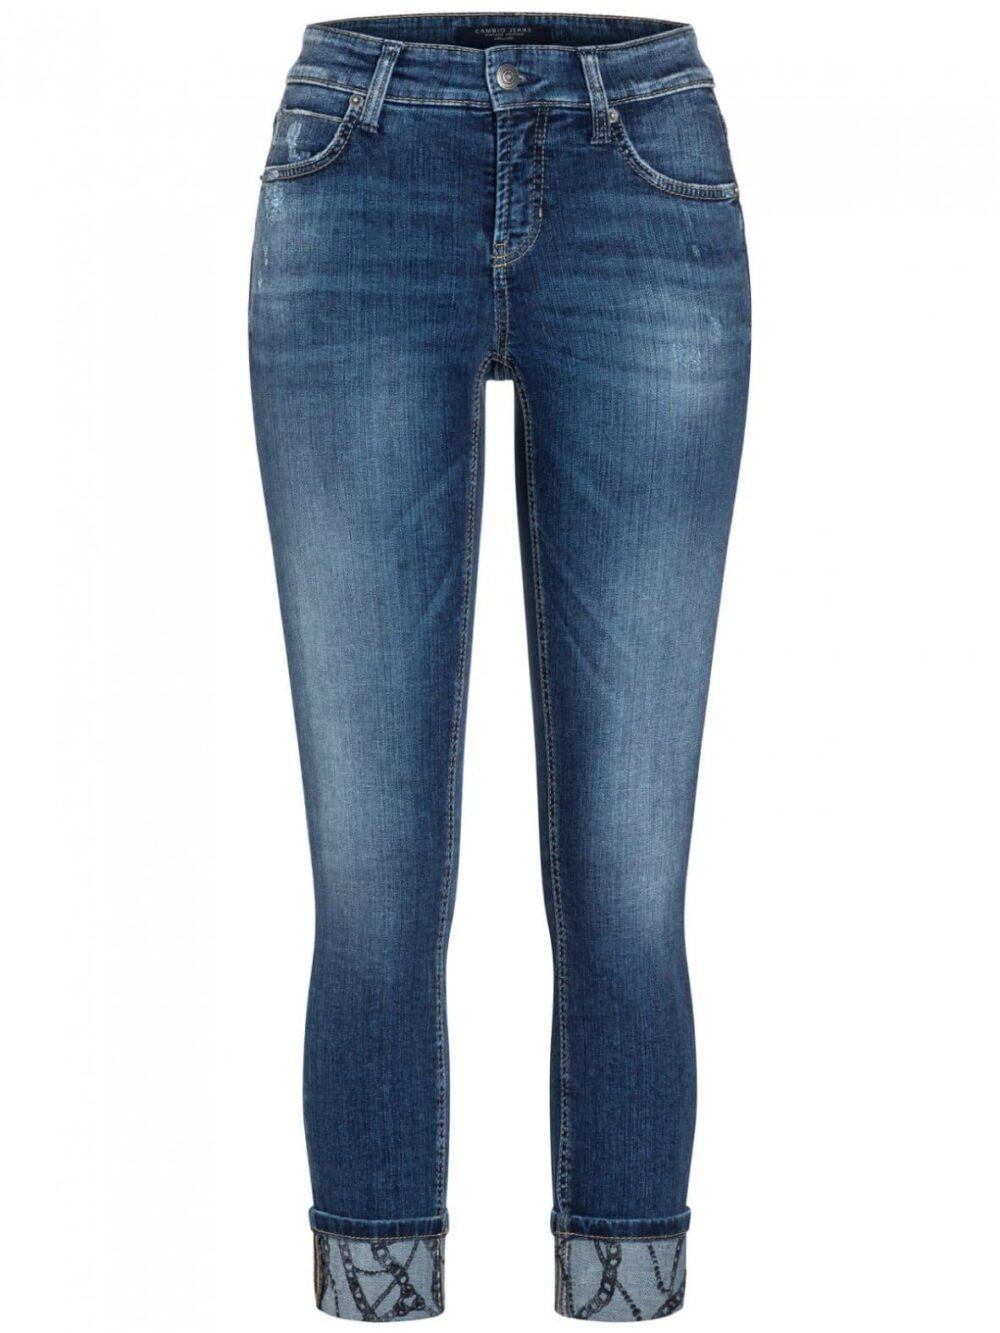 Cambio Pina Jeans 0020 12 9128 5176 1